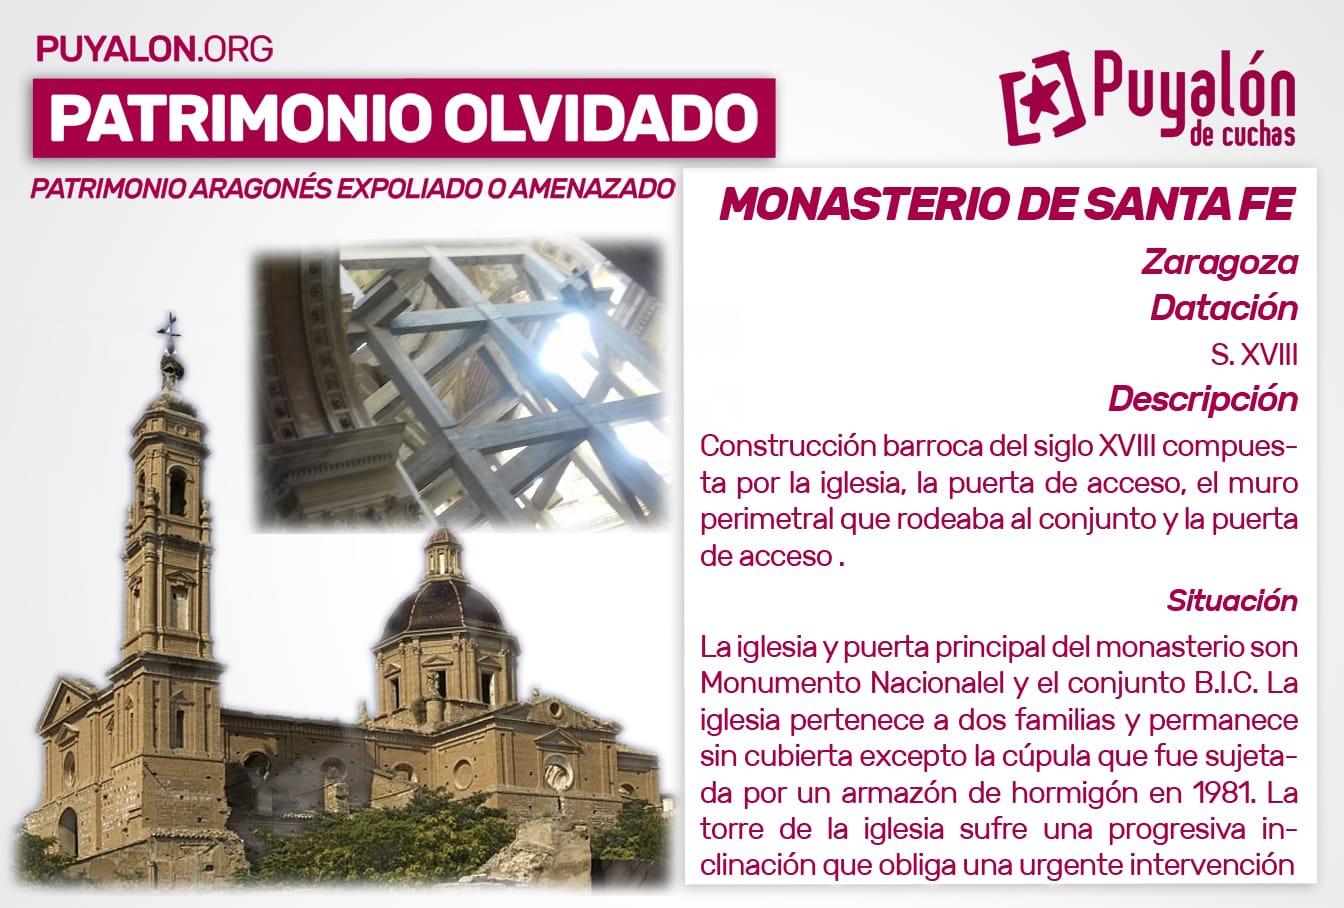 Monasterio de Santa Fe